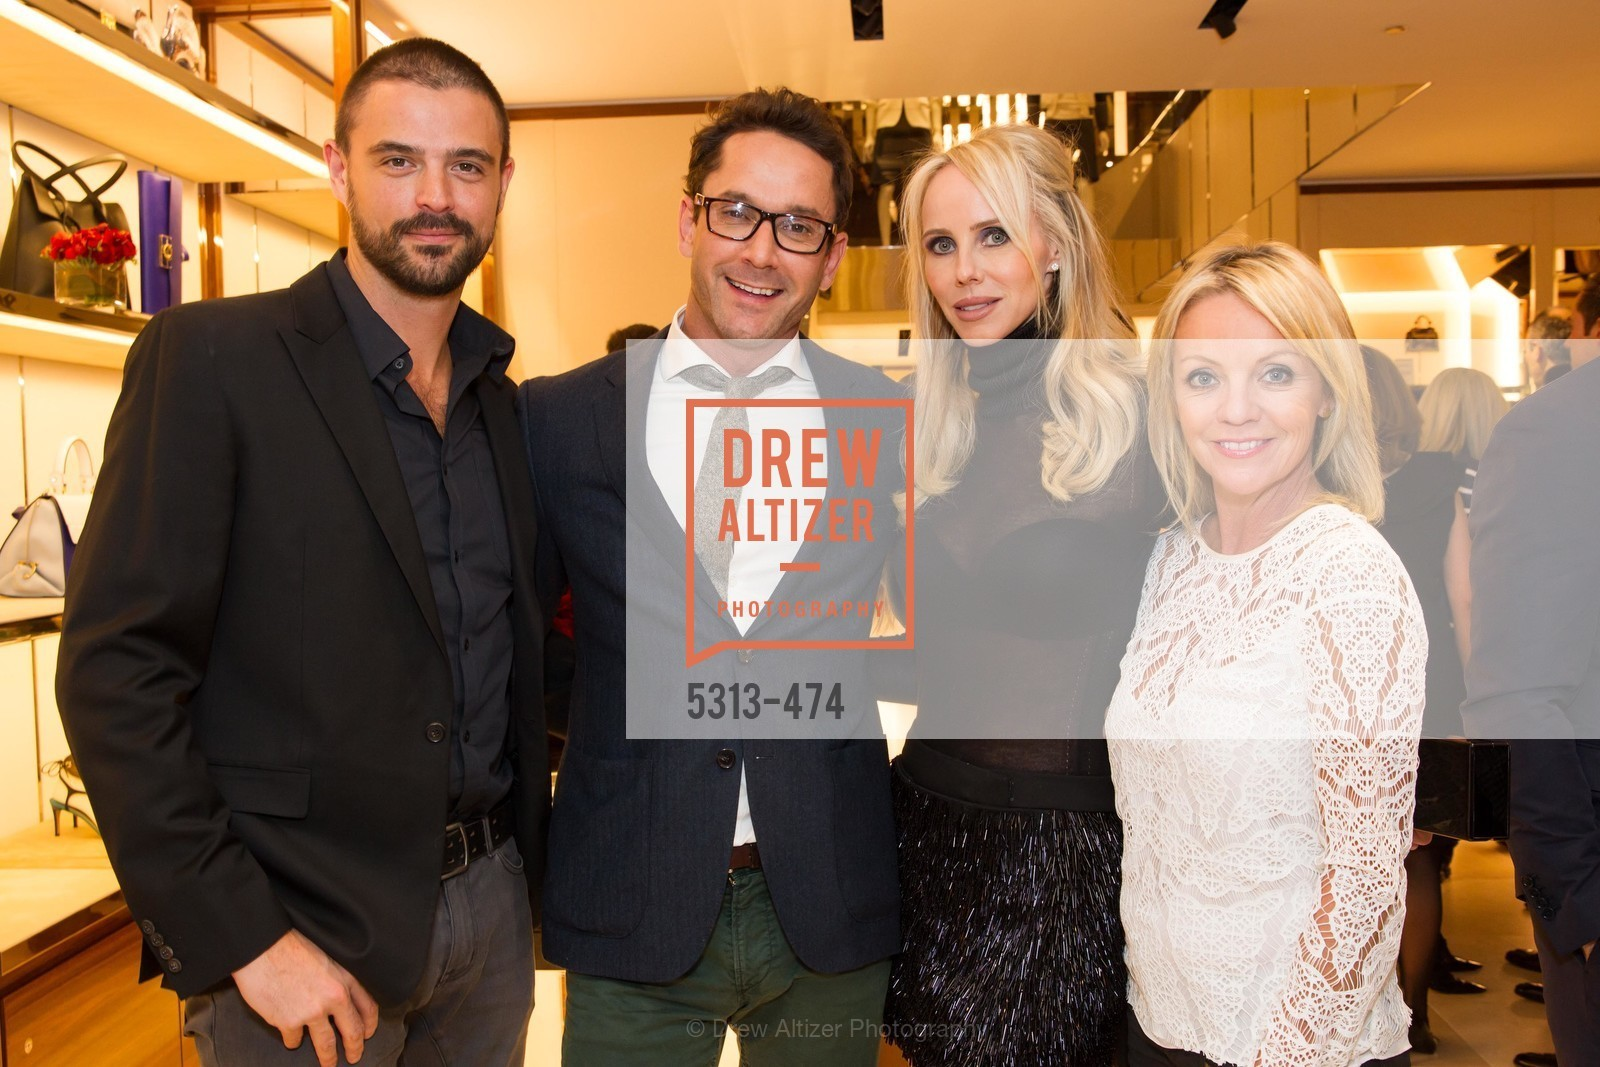 John Gidding, Damian Smith, Vanessa Getty, Angie Silvy, Photo #5313-474